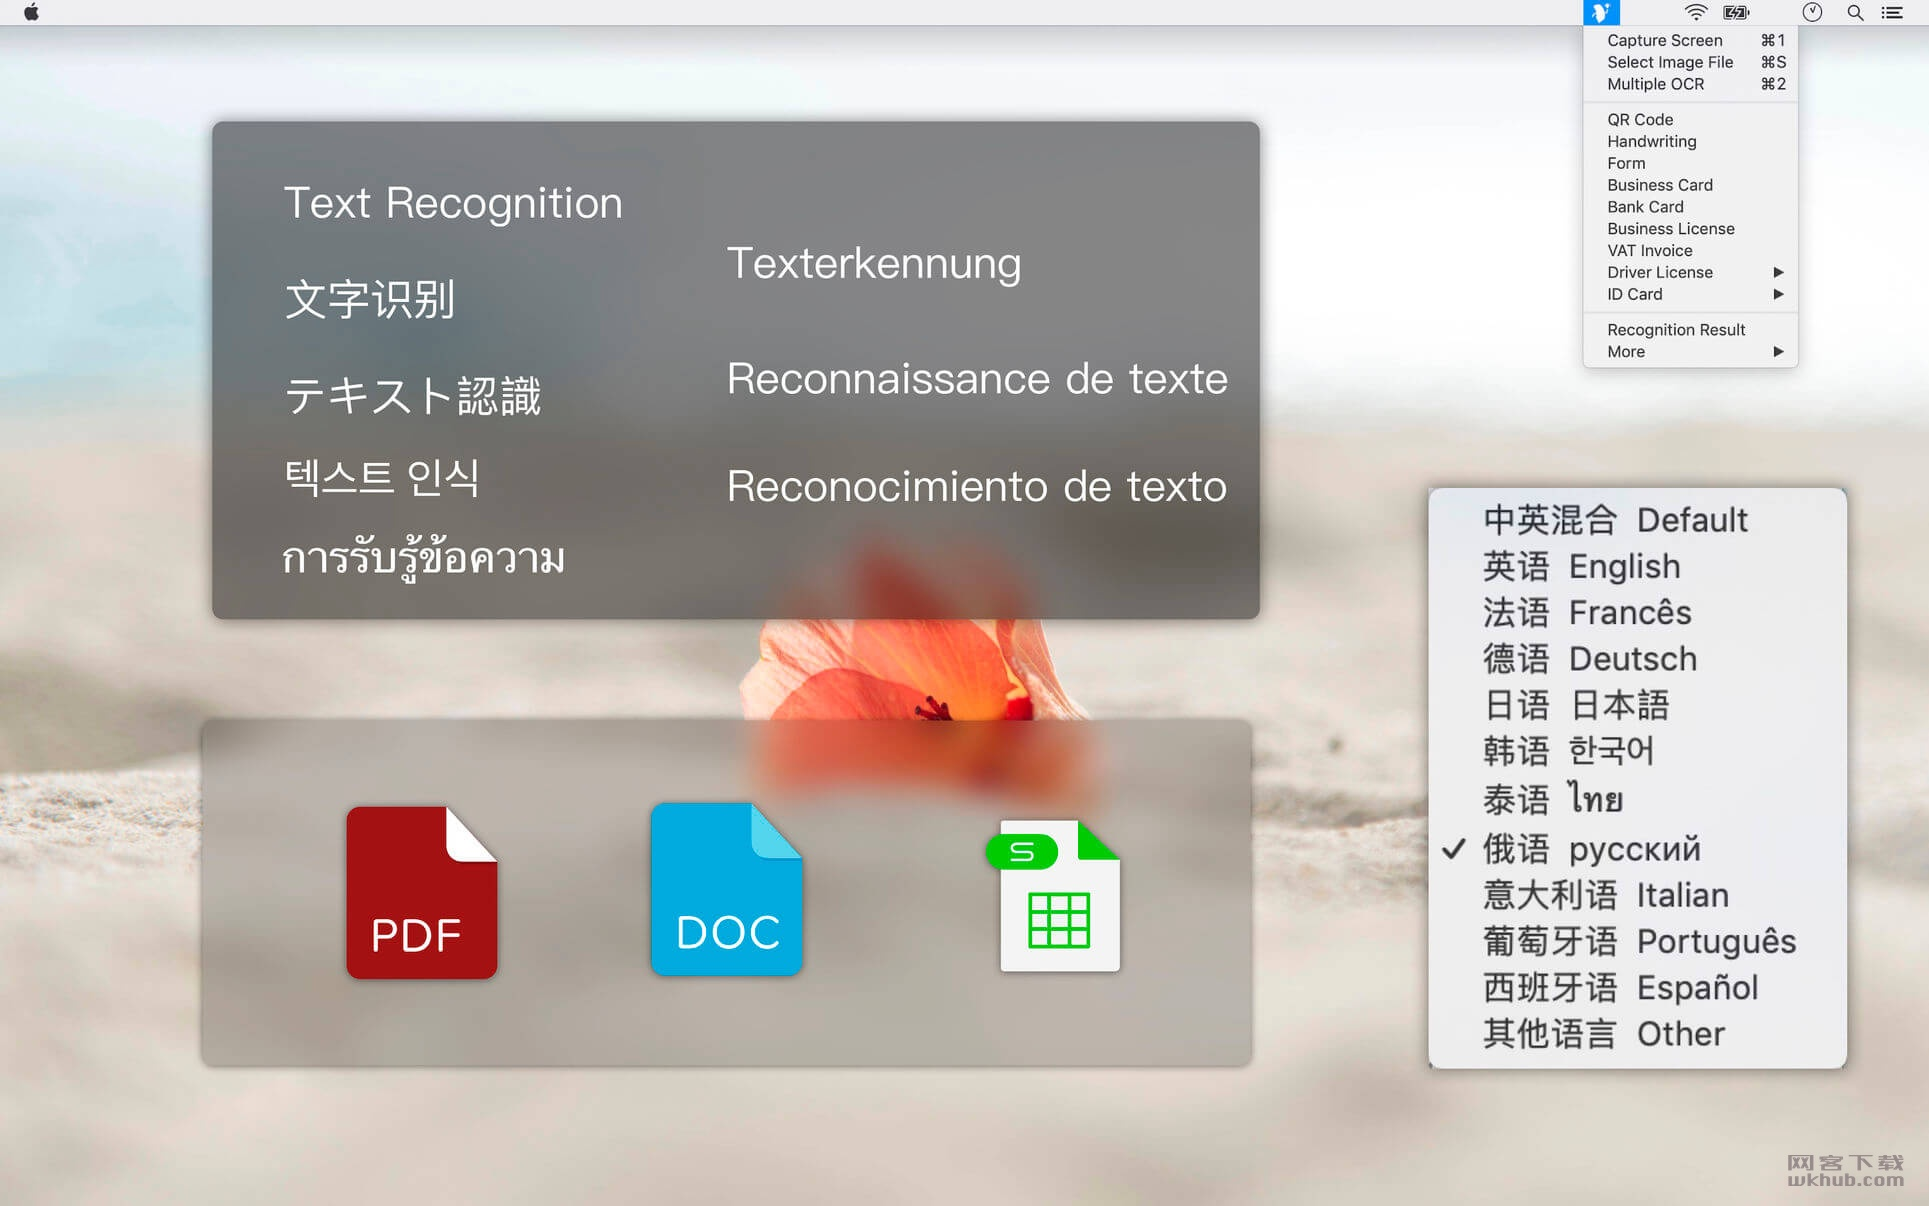 TextScan 1.0.2 文字扫描识别工具